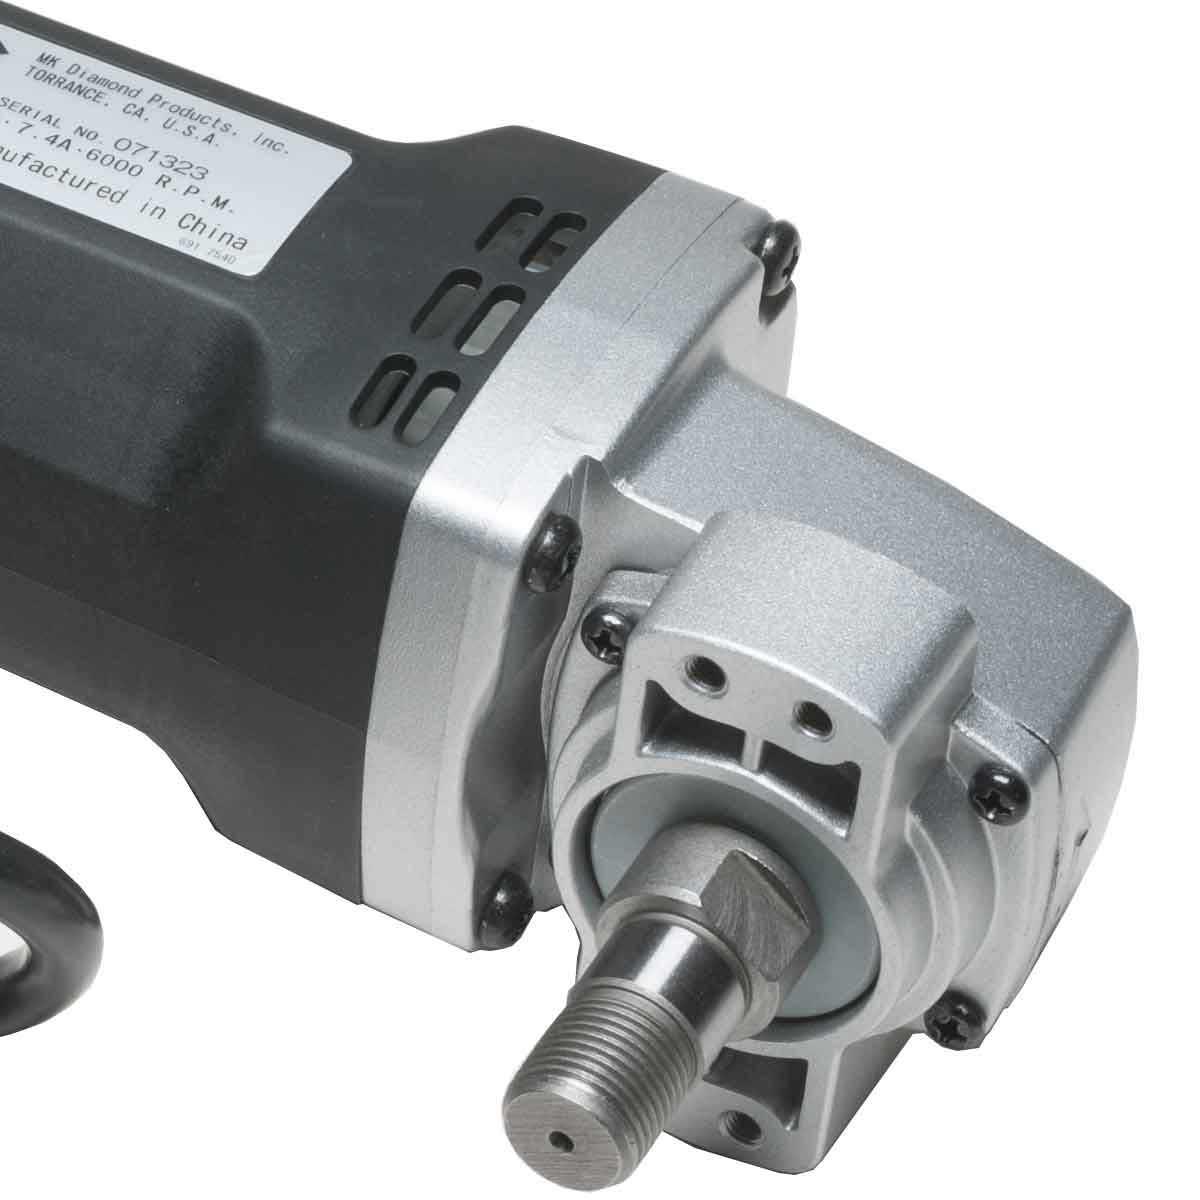 156428- Mk 370 Replacement Ryobi Motor. Contractors Direct